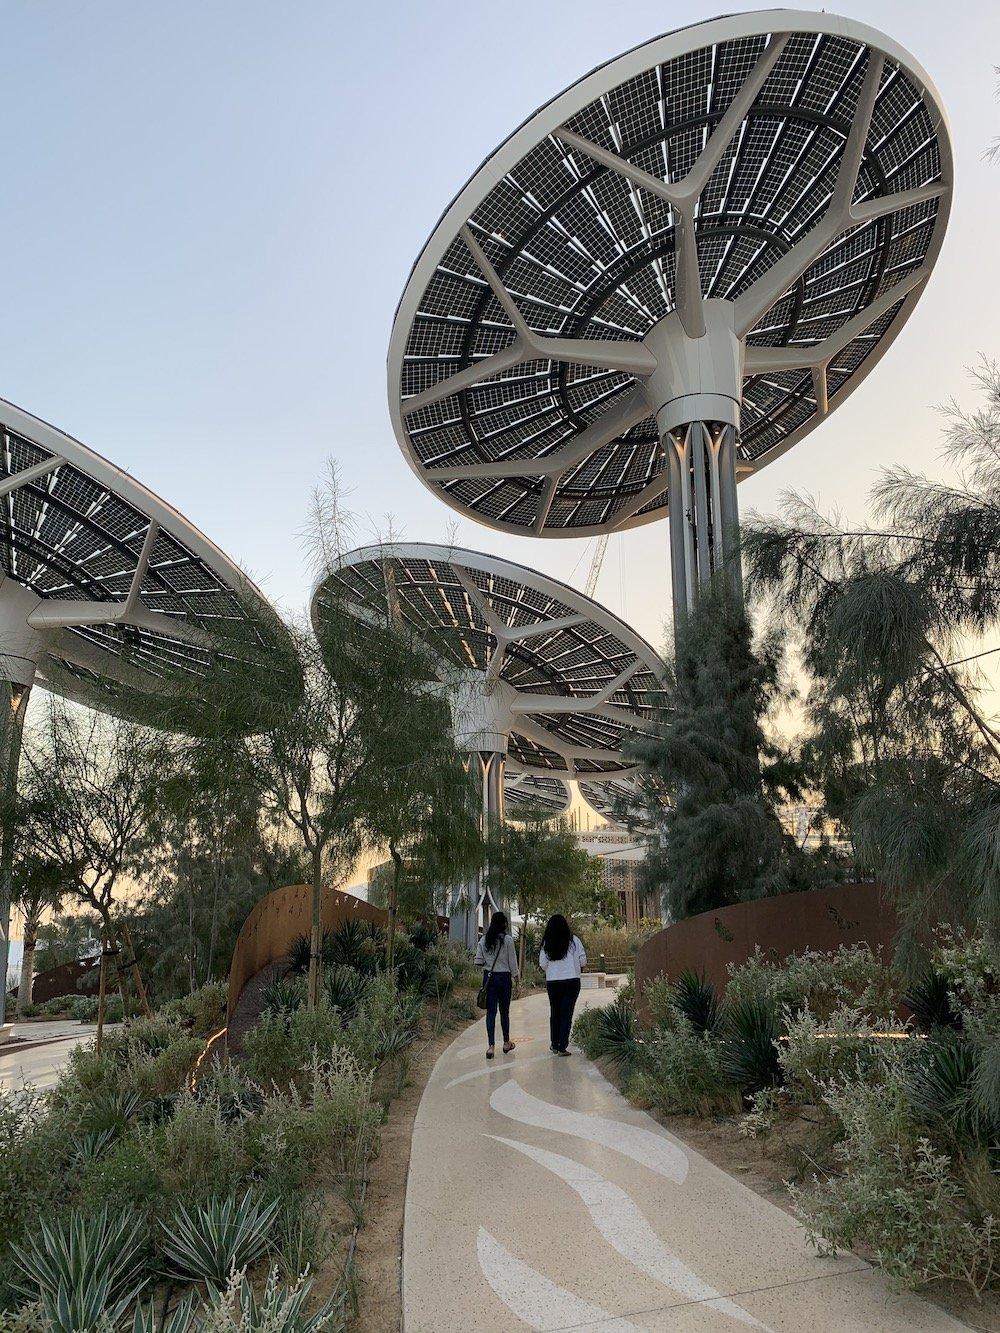 TERRA - SUSTAINABILITY PAVILION by Grimshaw Architects @ Expo 2020 Dubai - Photo ©Desert Ink.